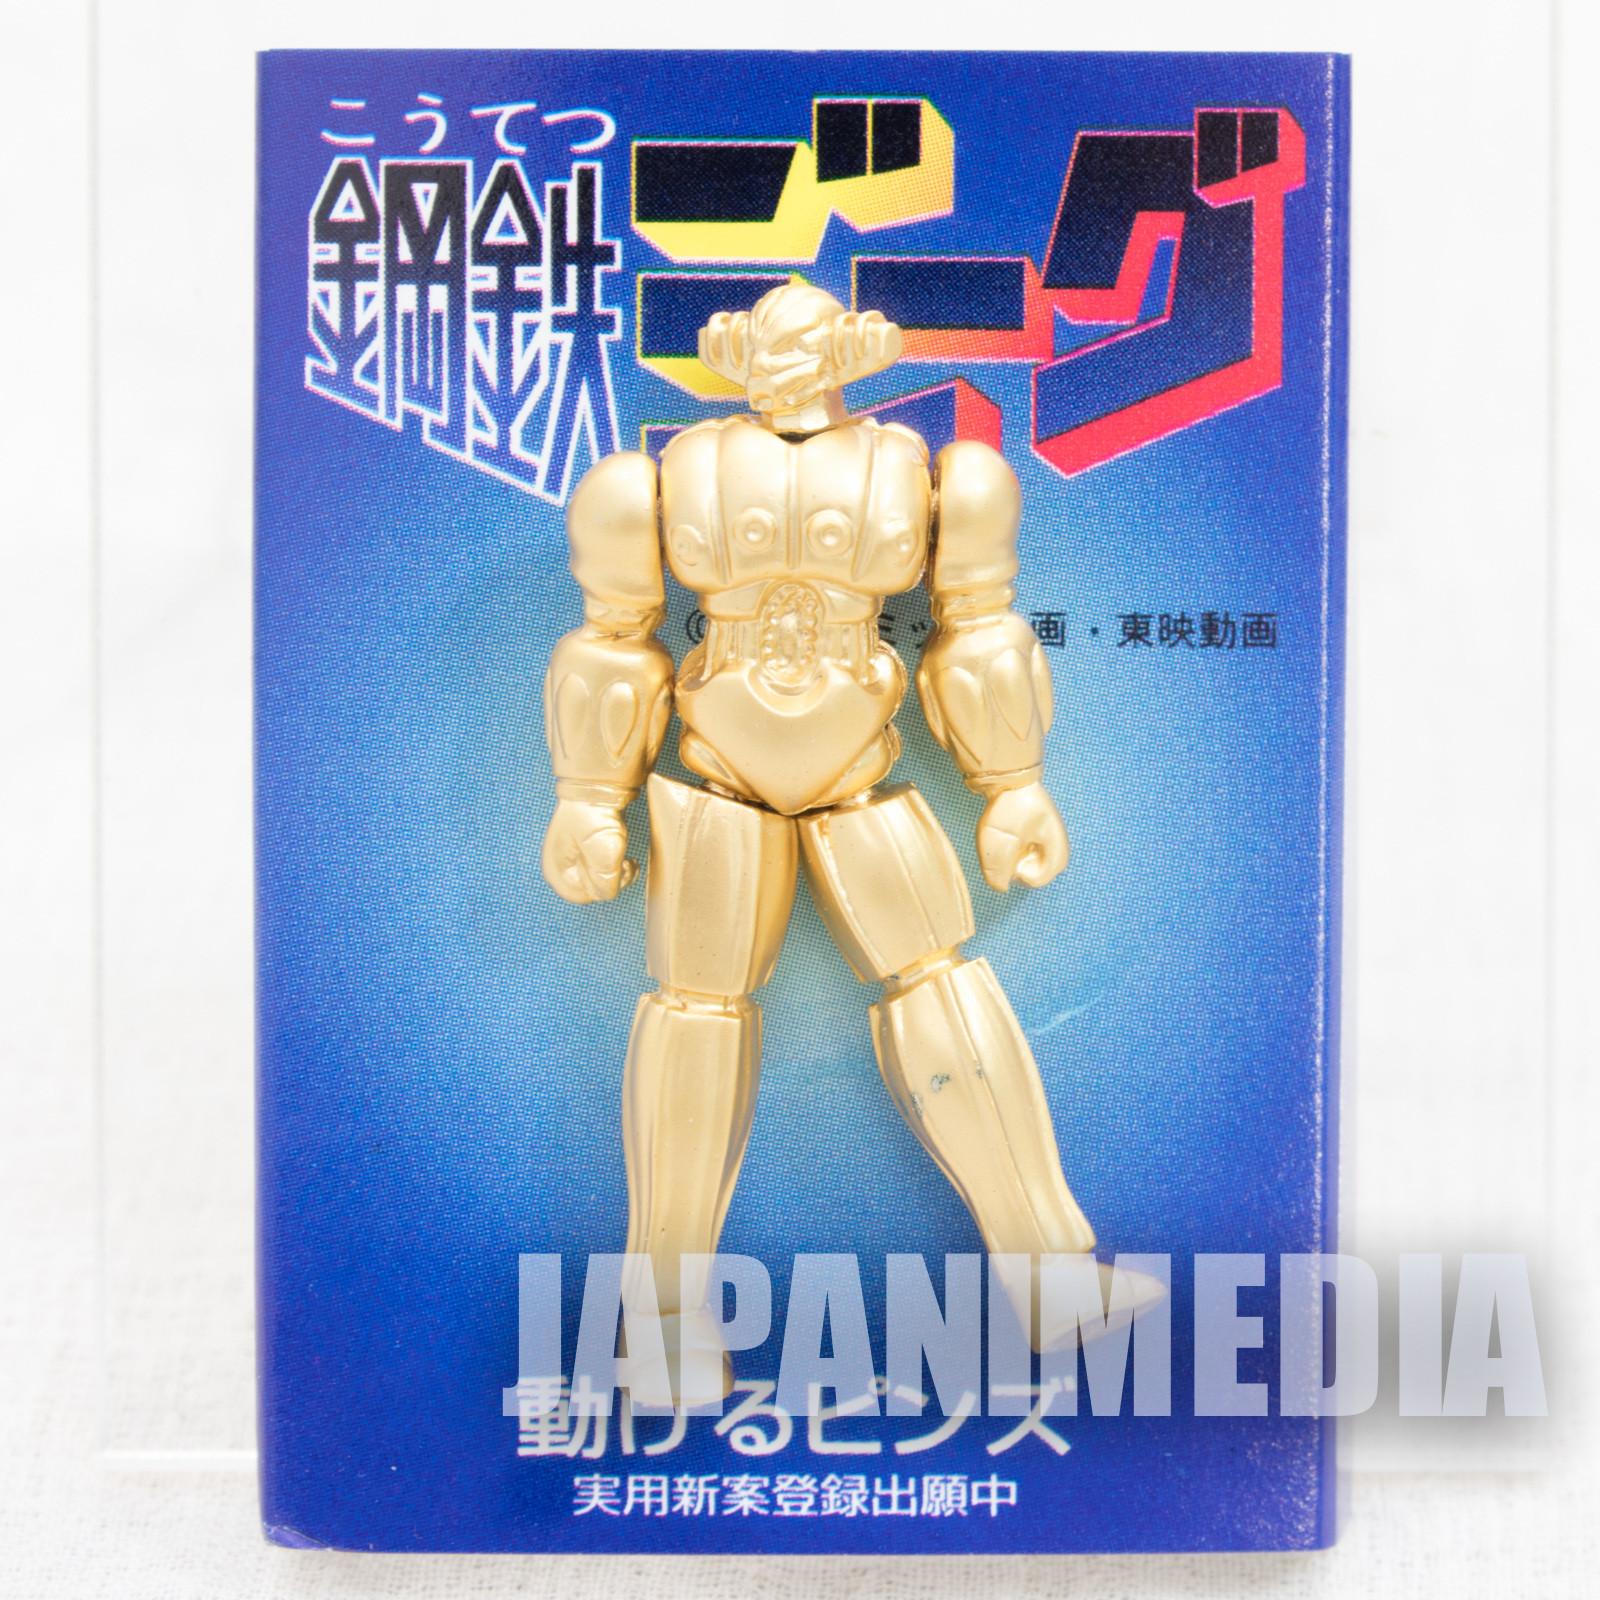 Retro Rare! Steel Jeeg Action Pins JAPAN ANIME MANGA